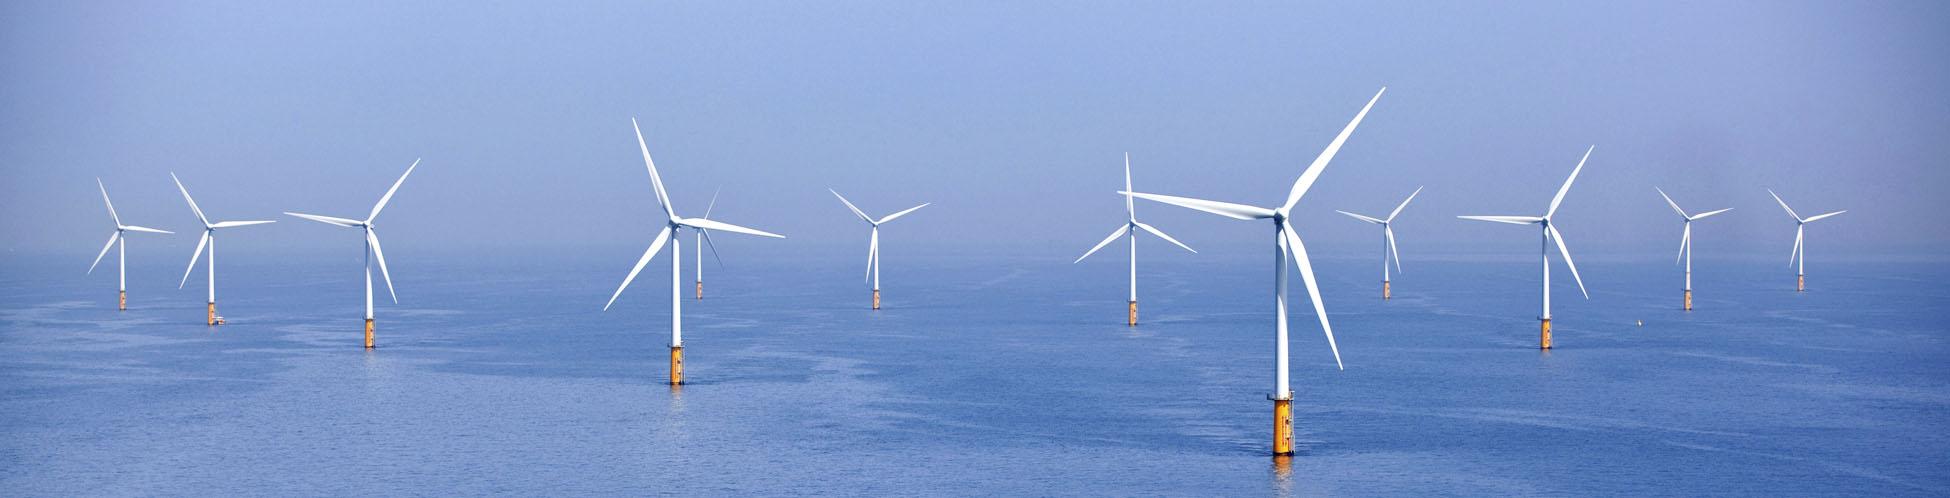 aero-generadores-offshore-b1